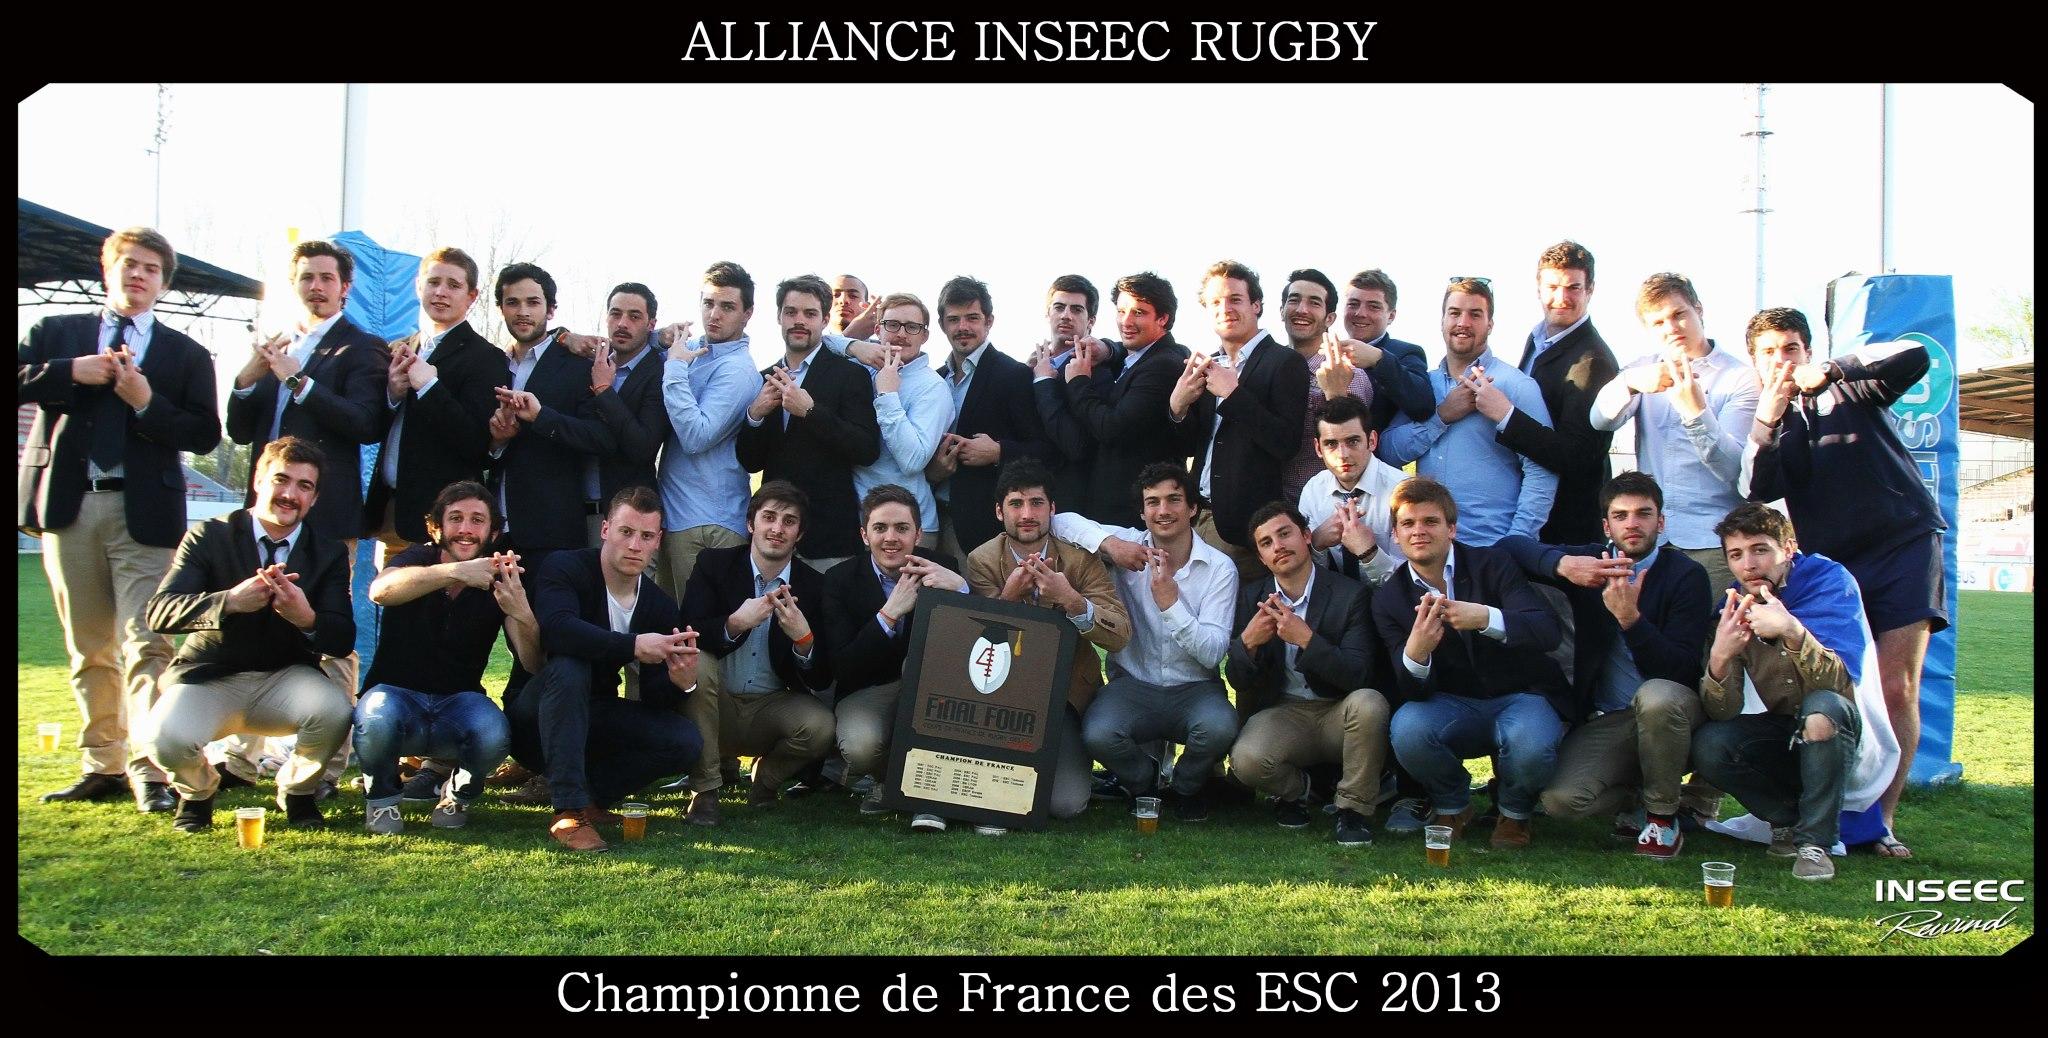 alliance-inseec-ece-championne-de-France-ESC-rugby